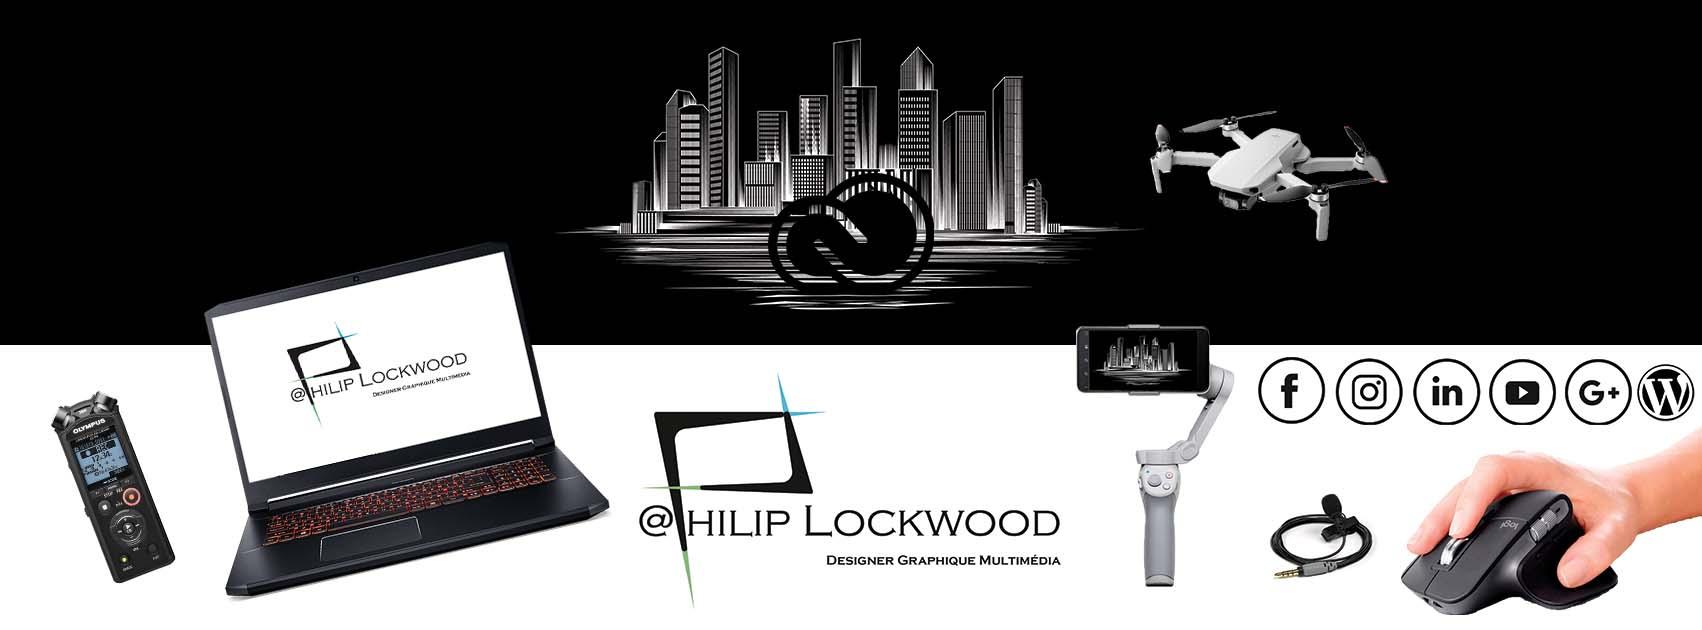 @Philip Lockwood